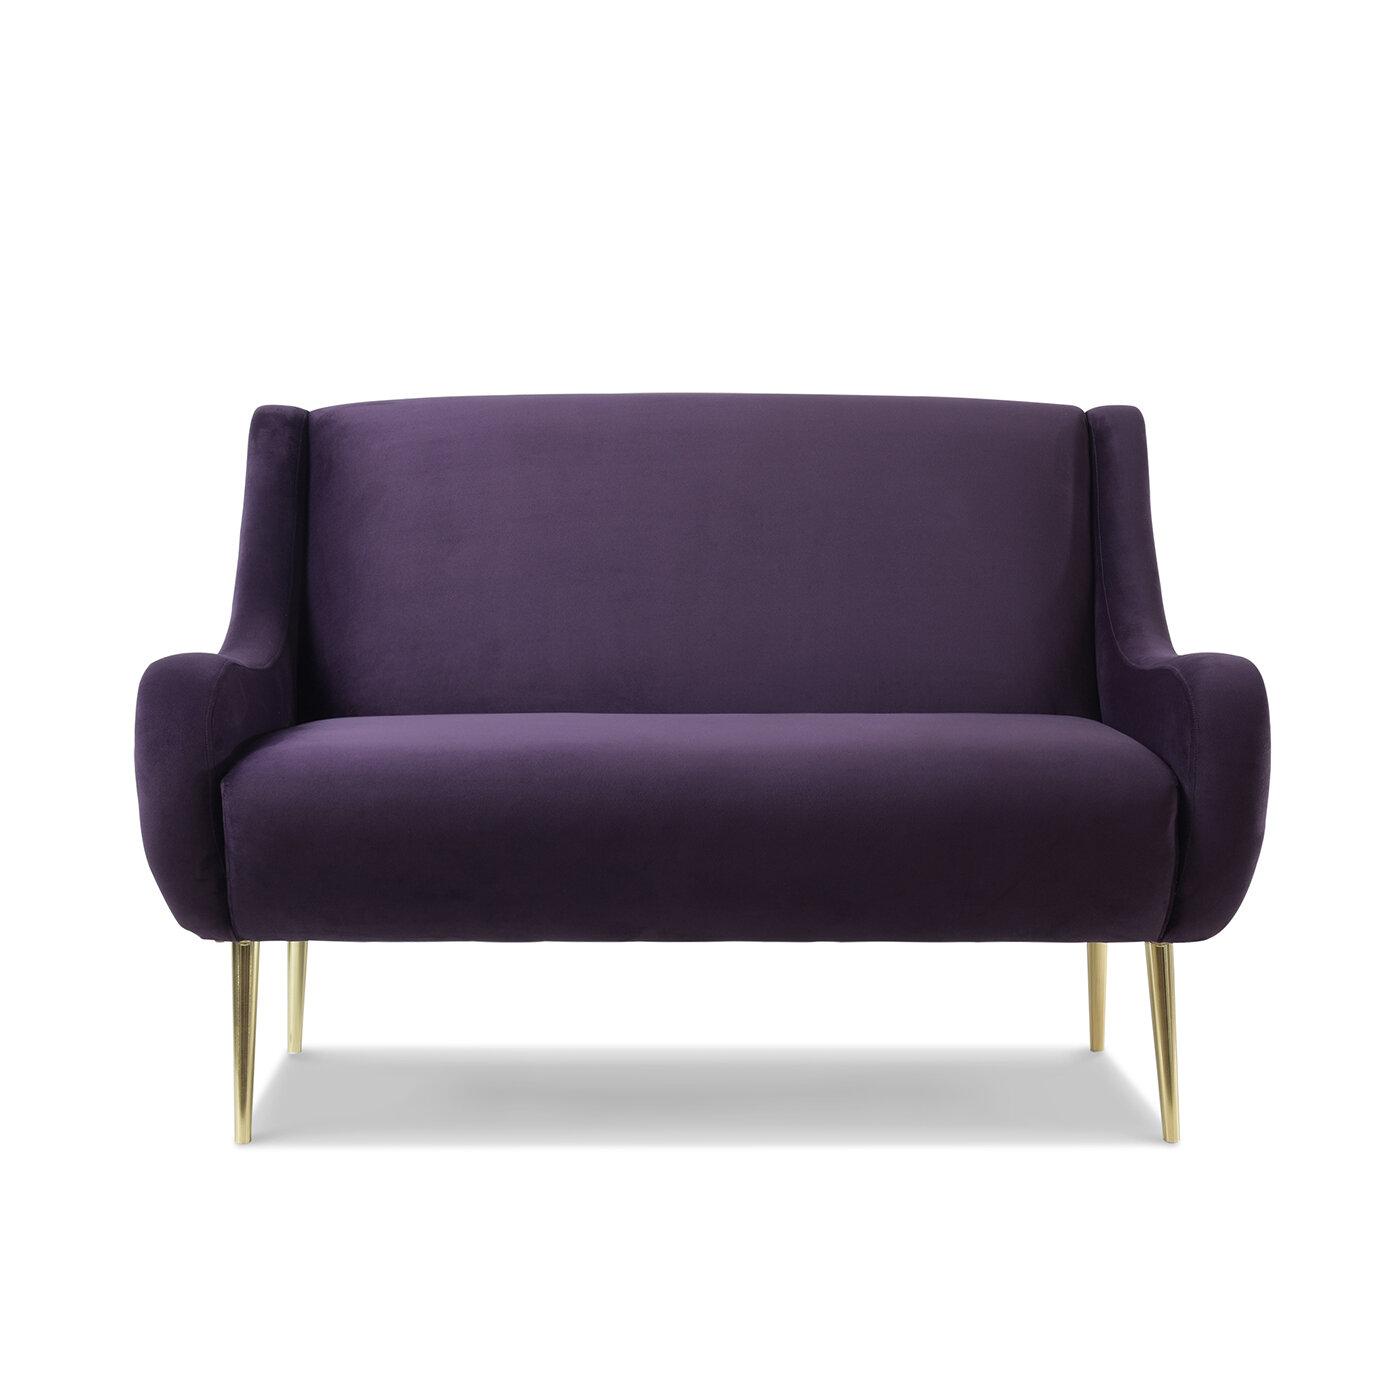 Pleasant Tilford Loveseat Lamtechconsult Wood Chair Design Ideas Lamtechconsultcom